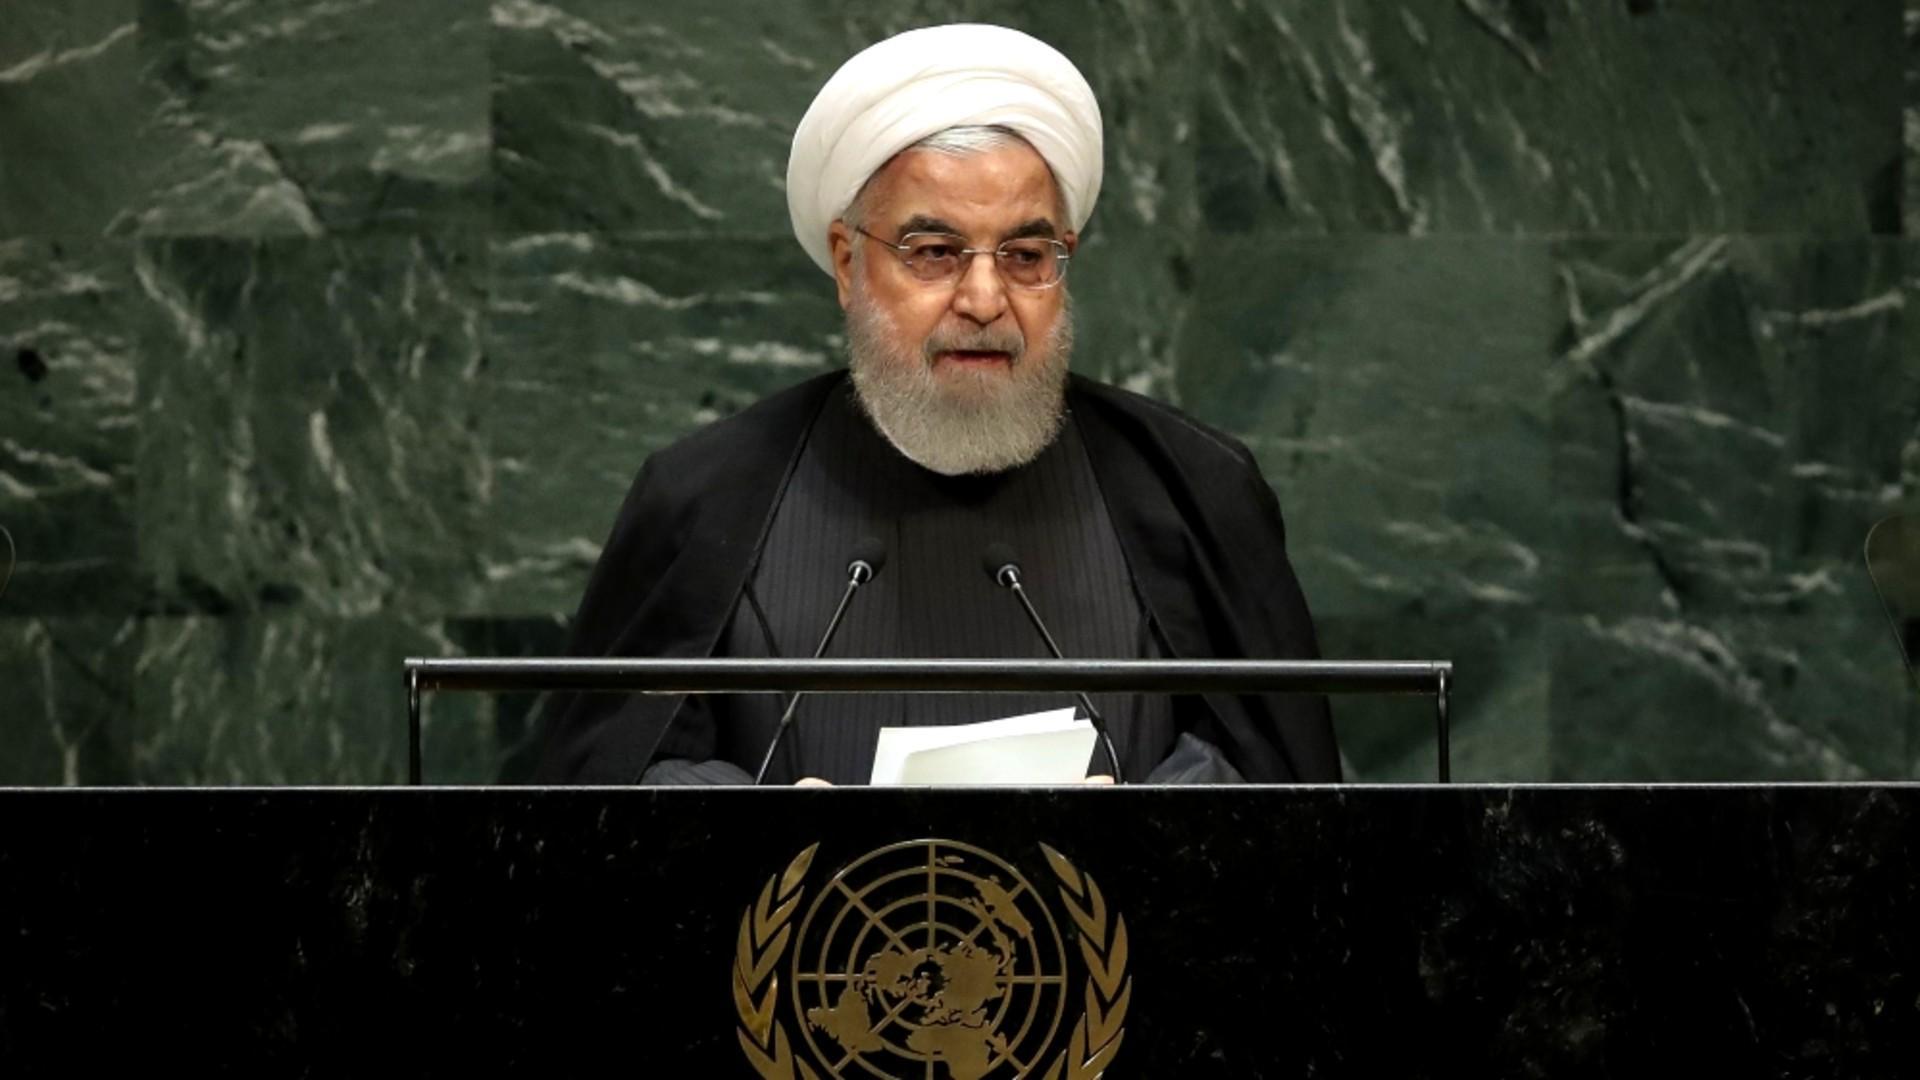 No UN breakthrough as Iran snubs talks until US lifts sanctions